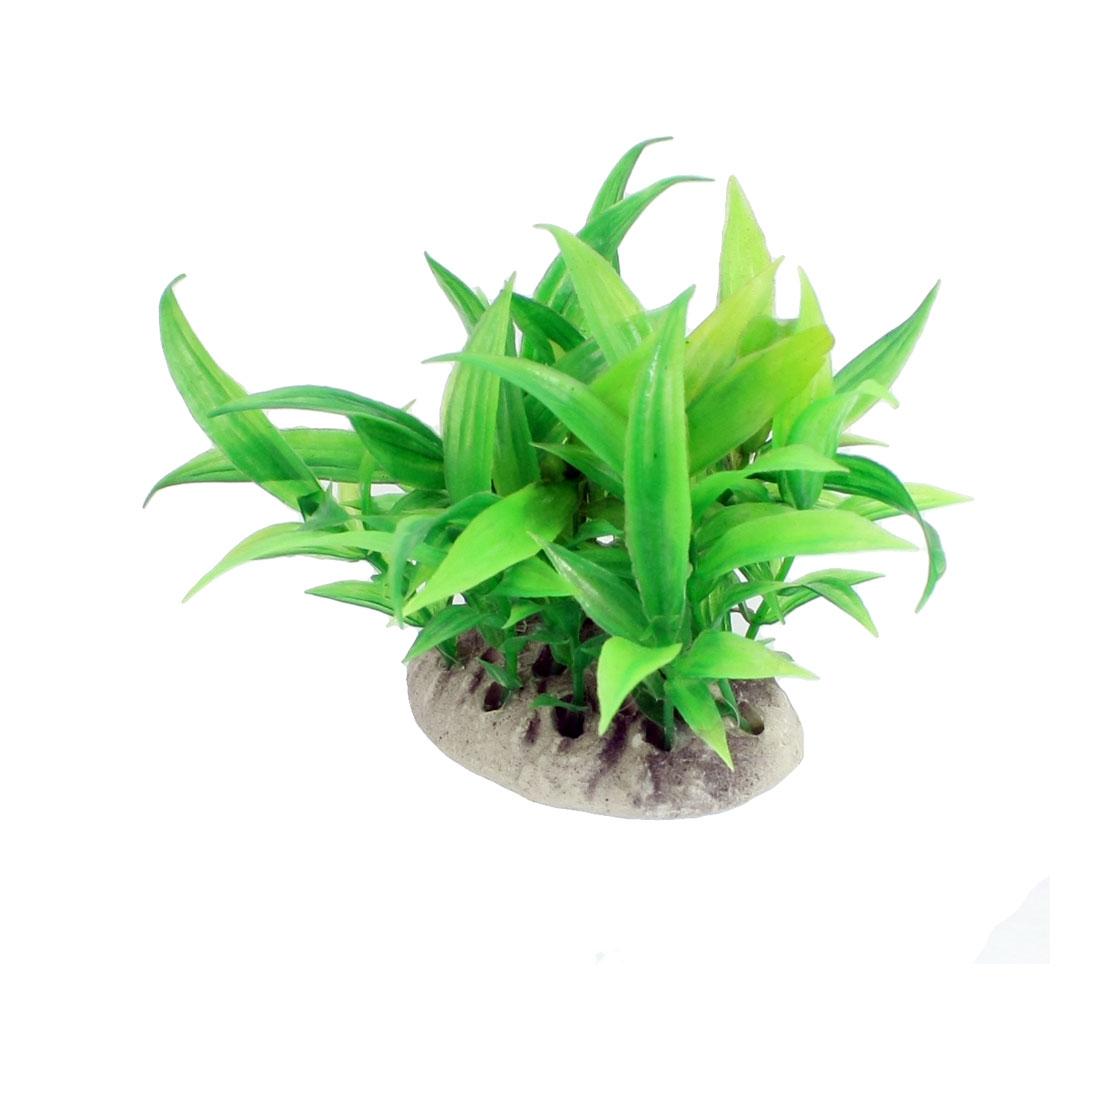 "10 Pcs Aquarium Tank Green Plastic Plant Decor 3.5"" Height w Ceramic Base"